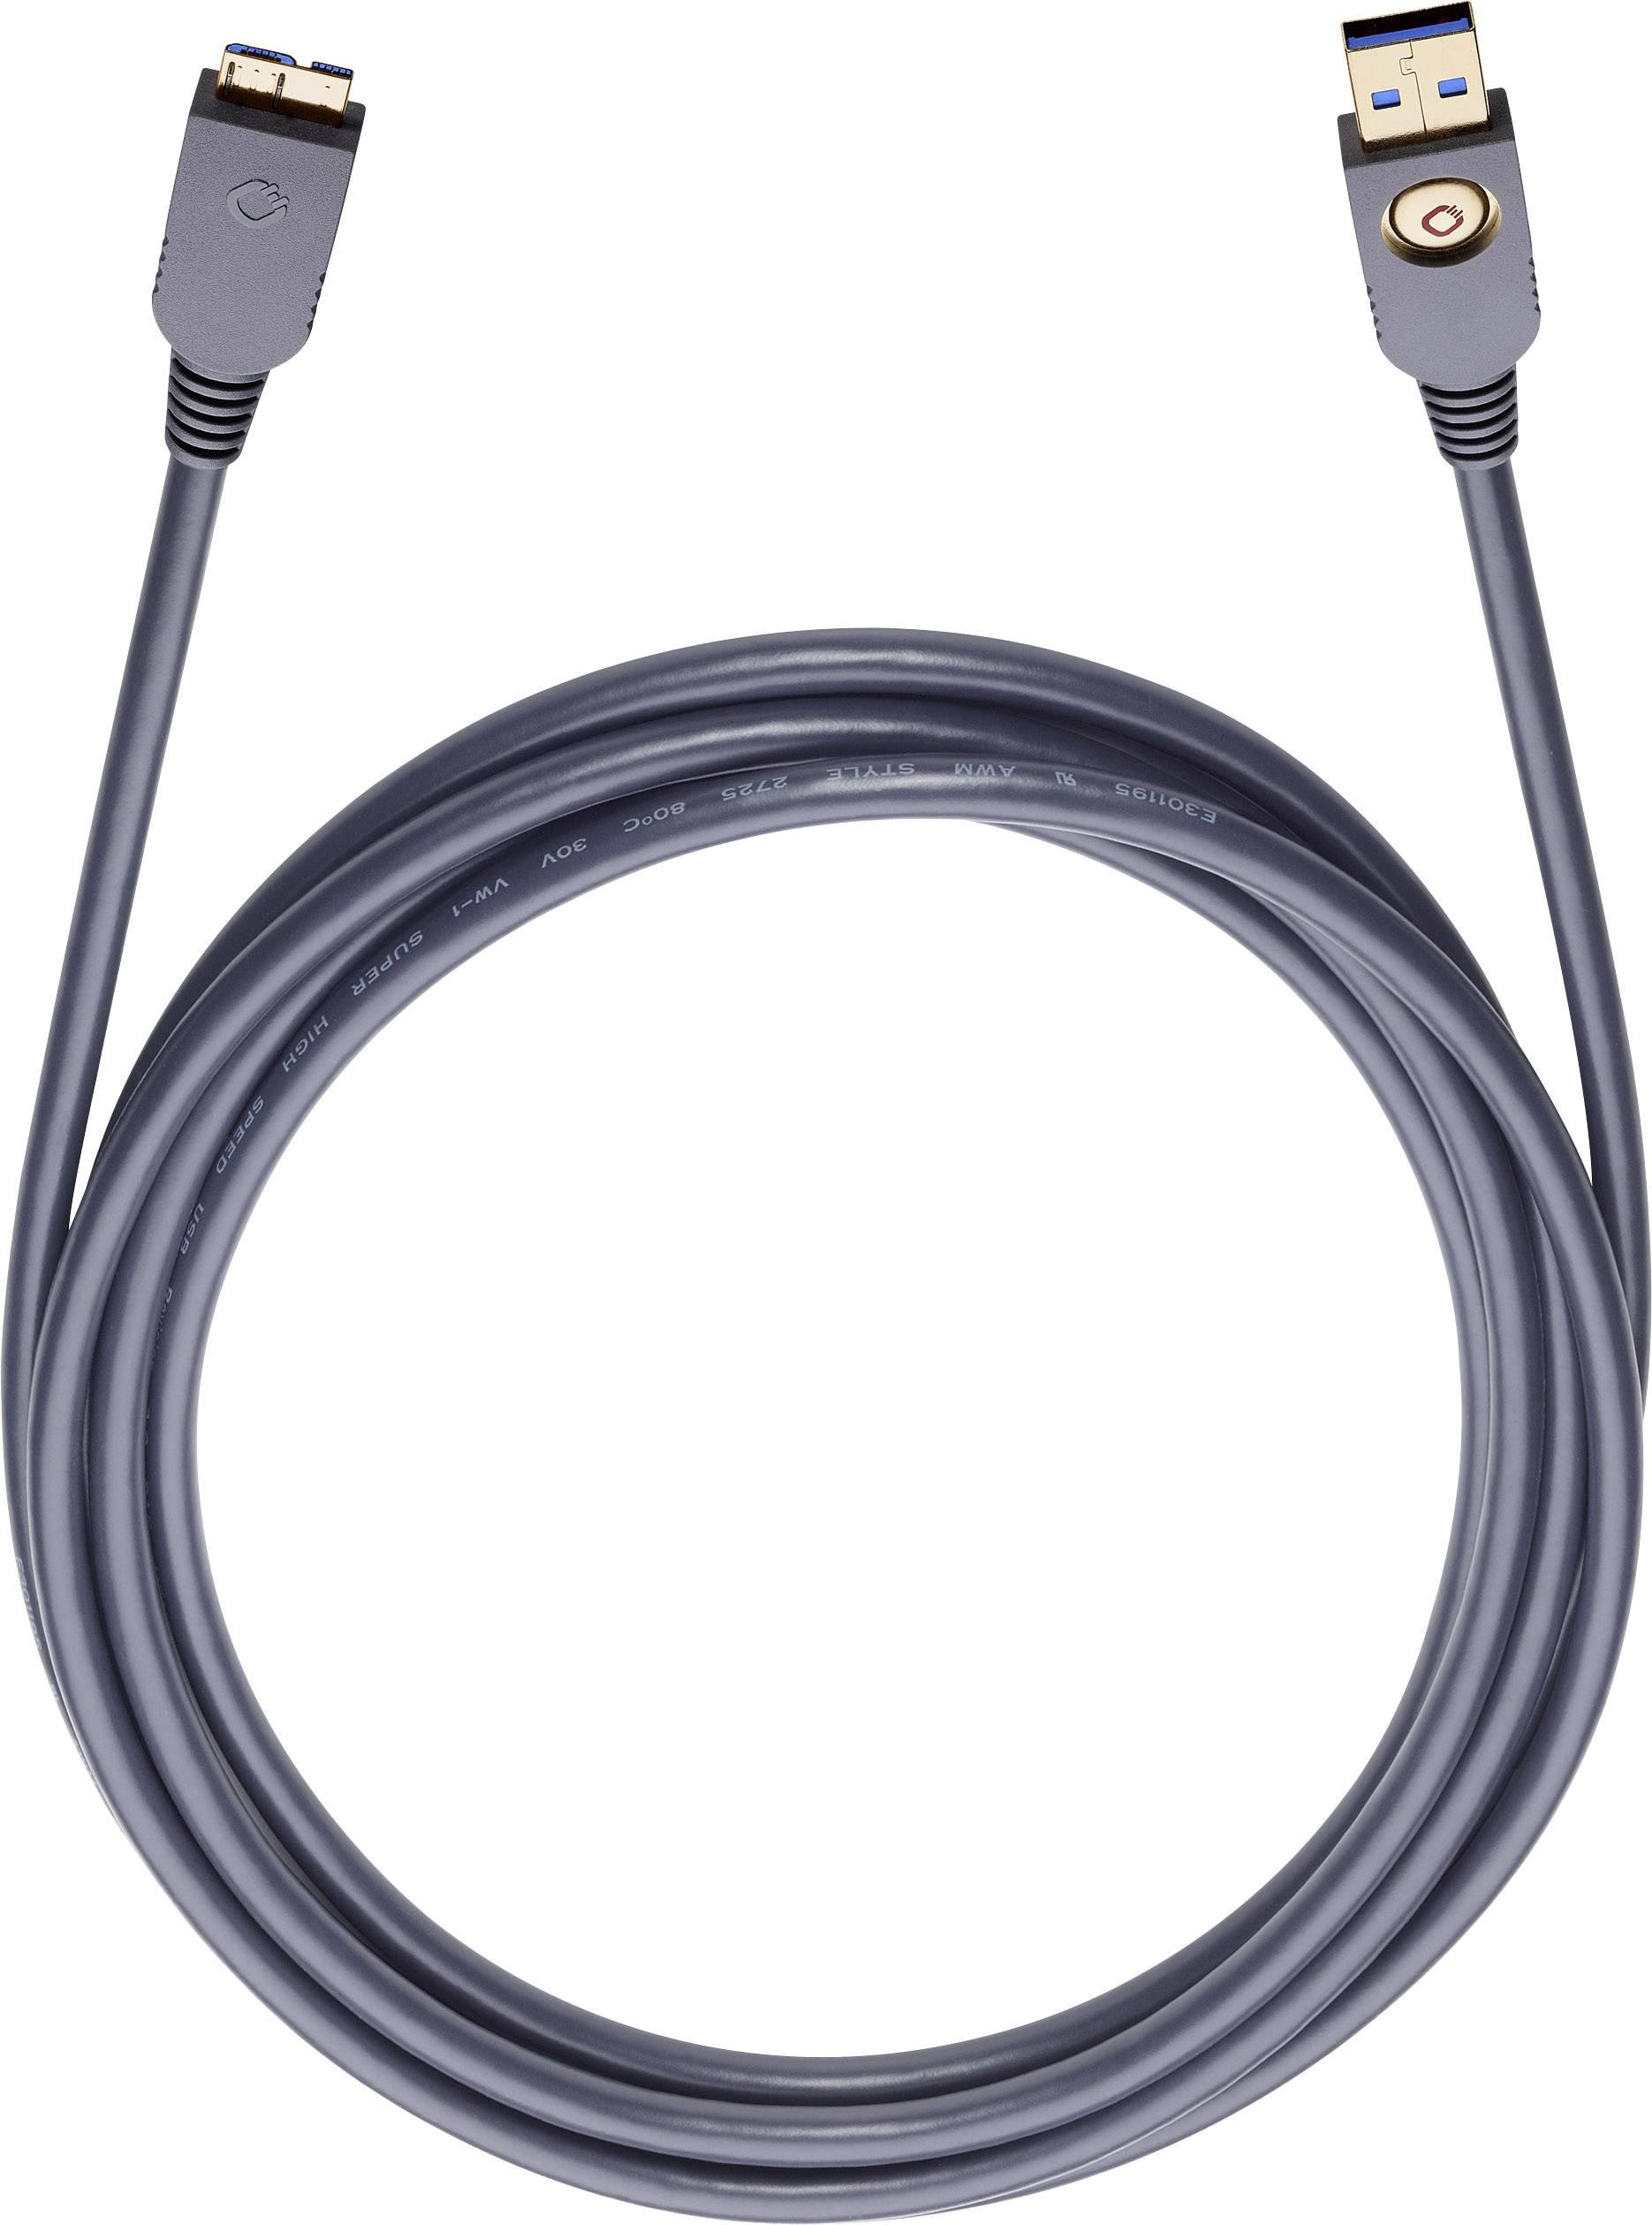 Oehlbach USB 3.0 Cavo di colle